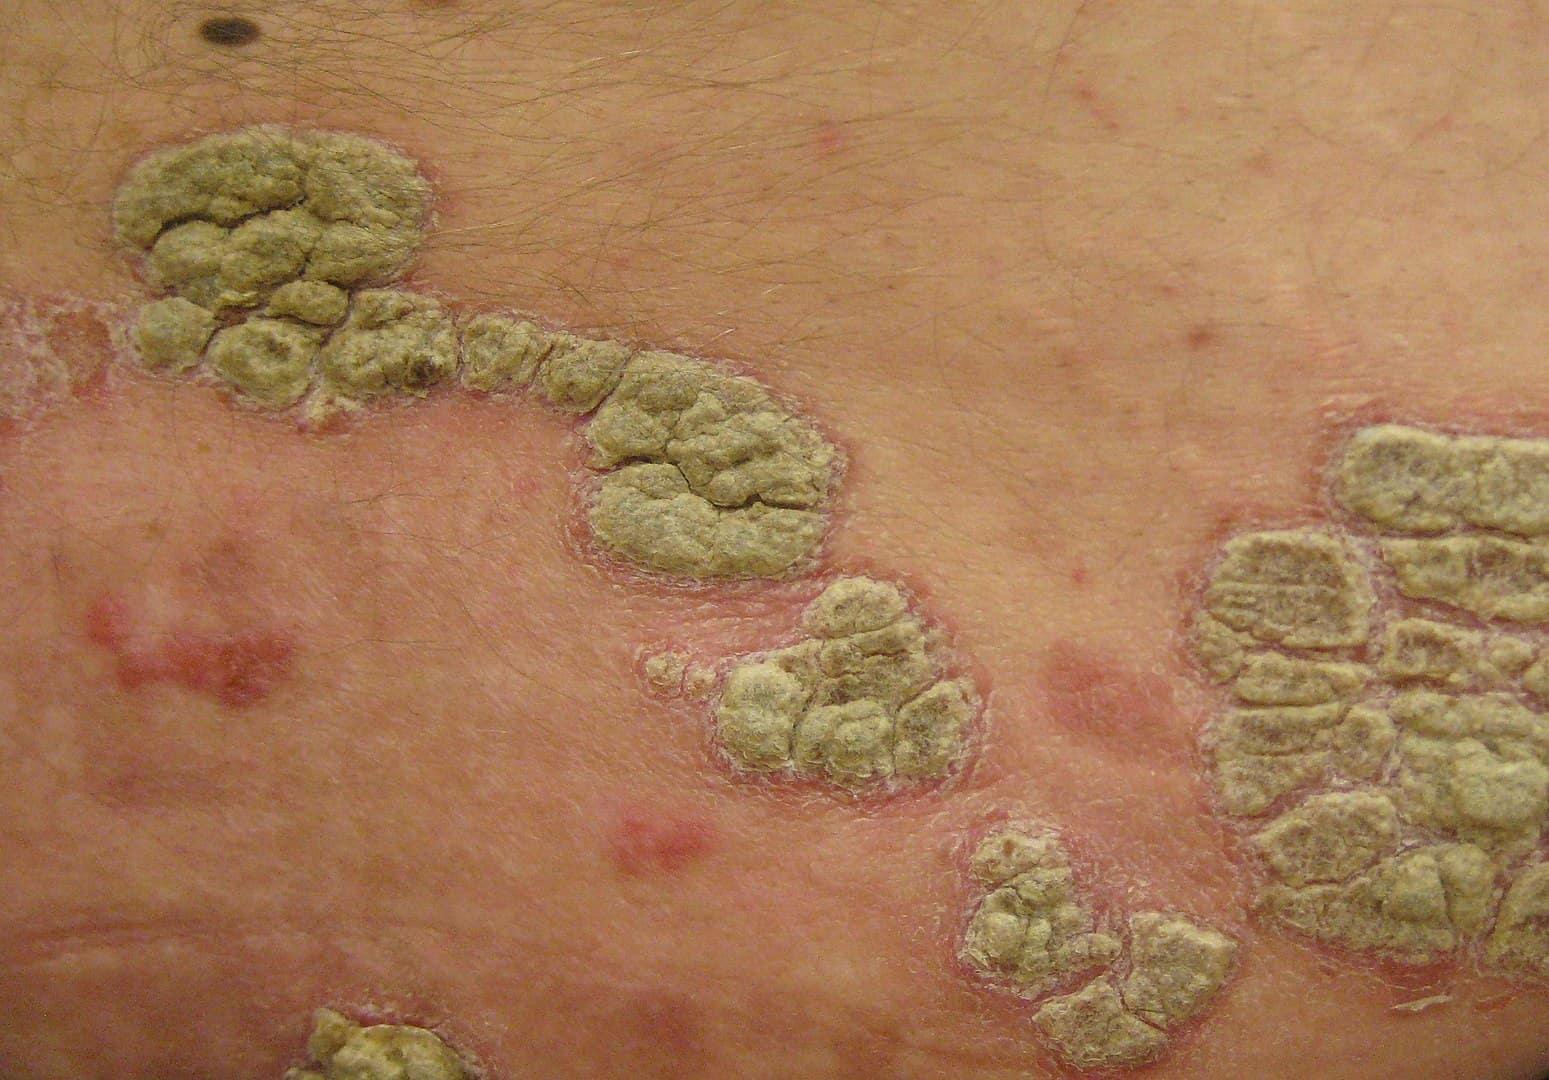 psoriasis, lupus facts